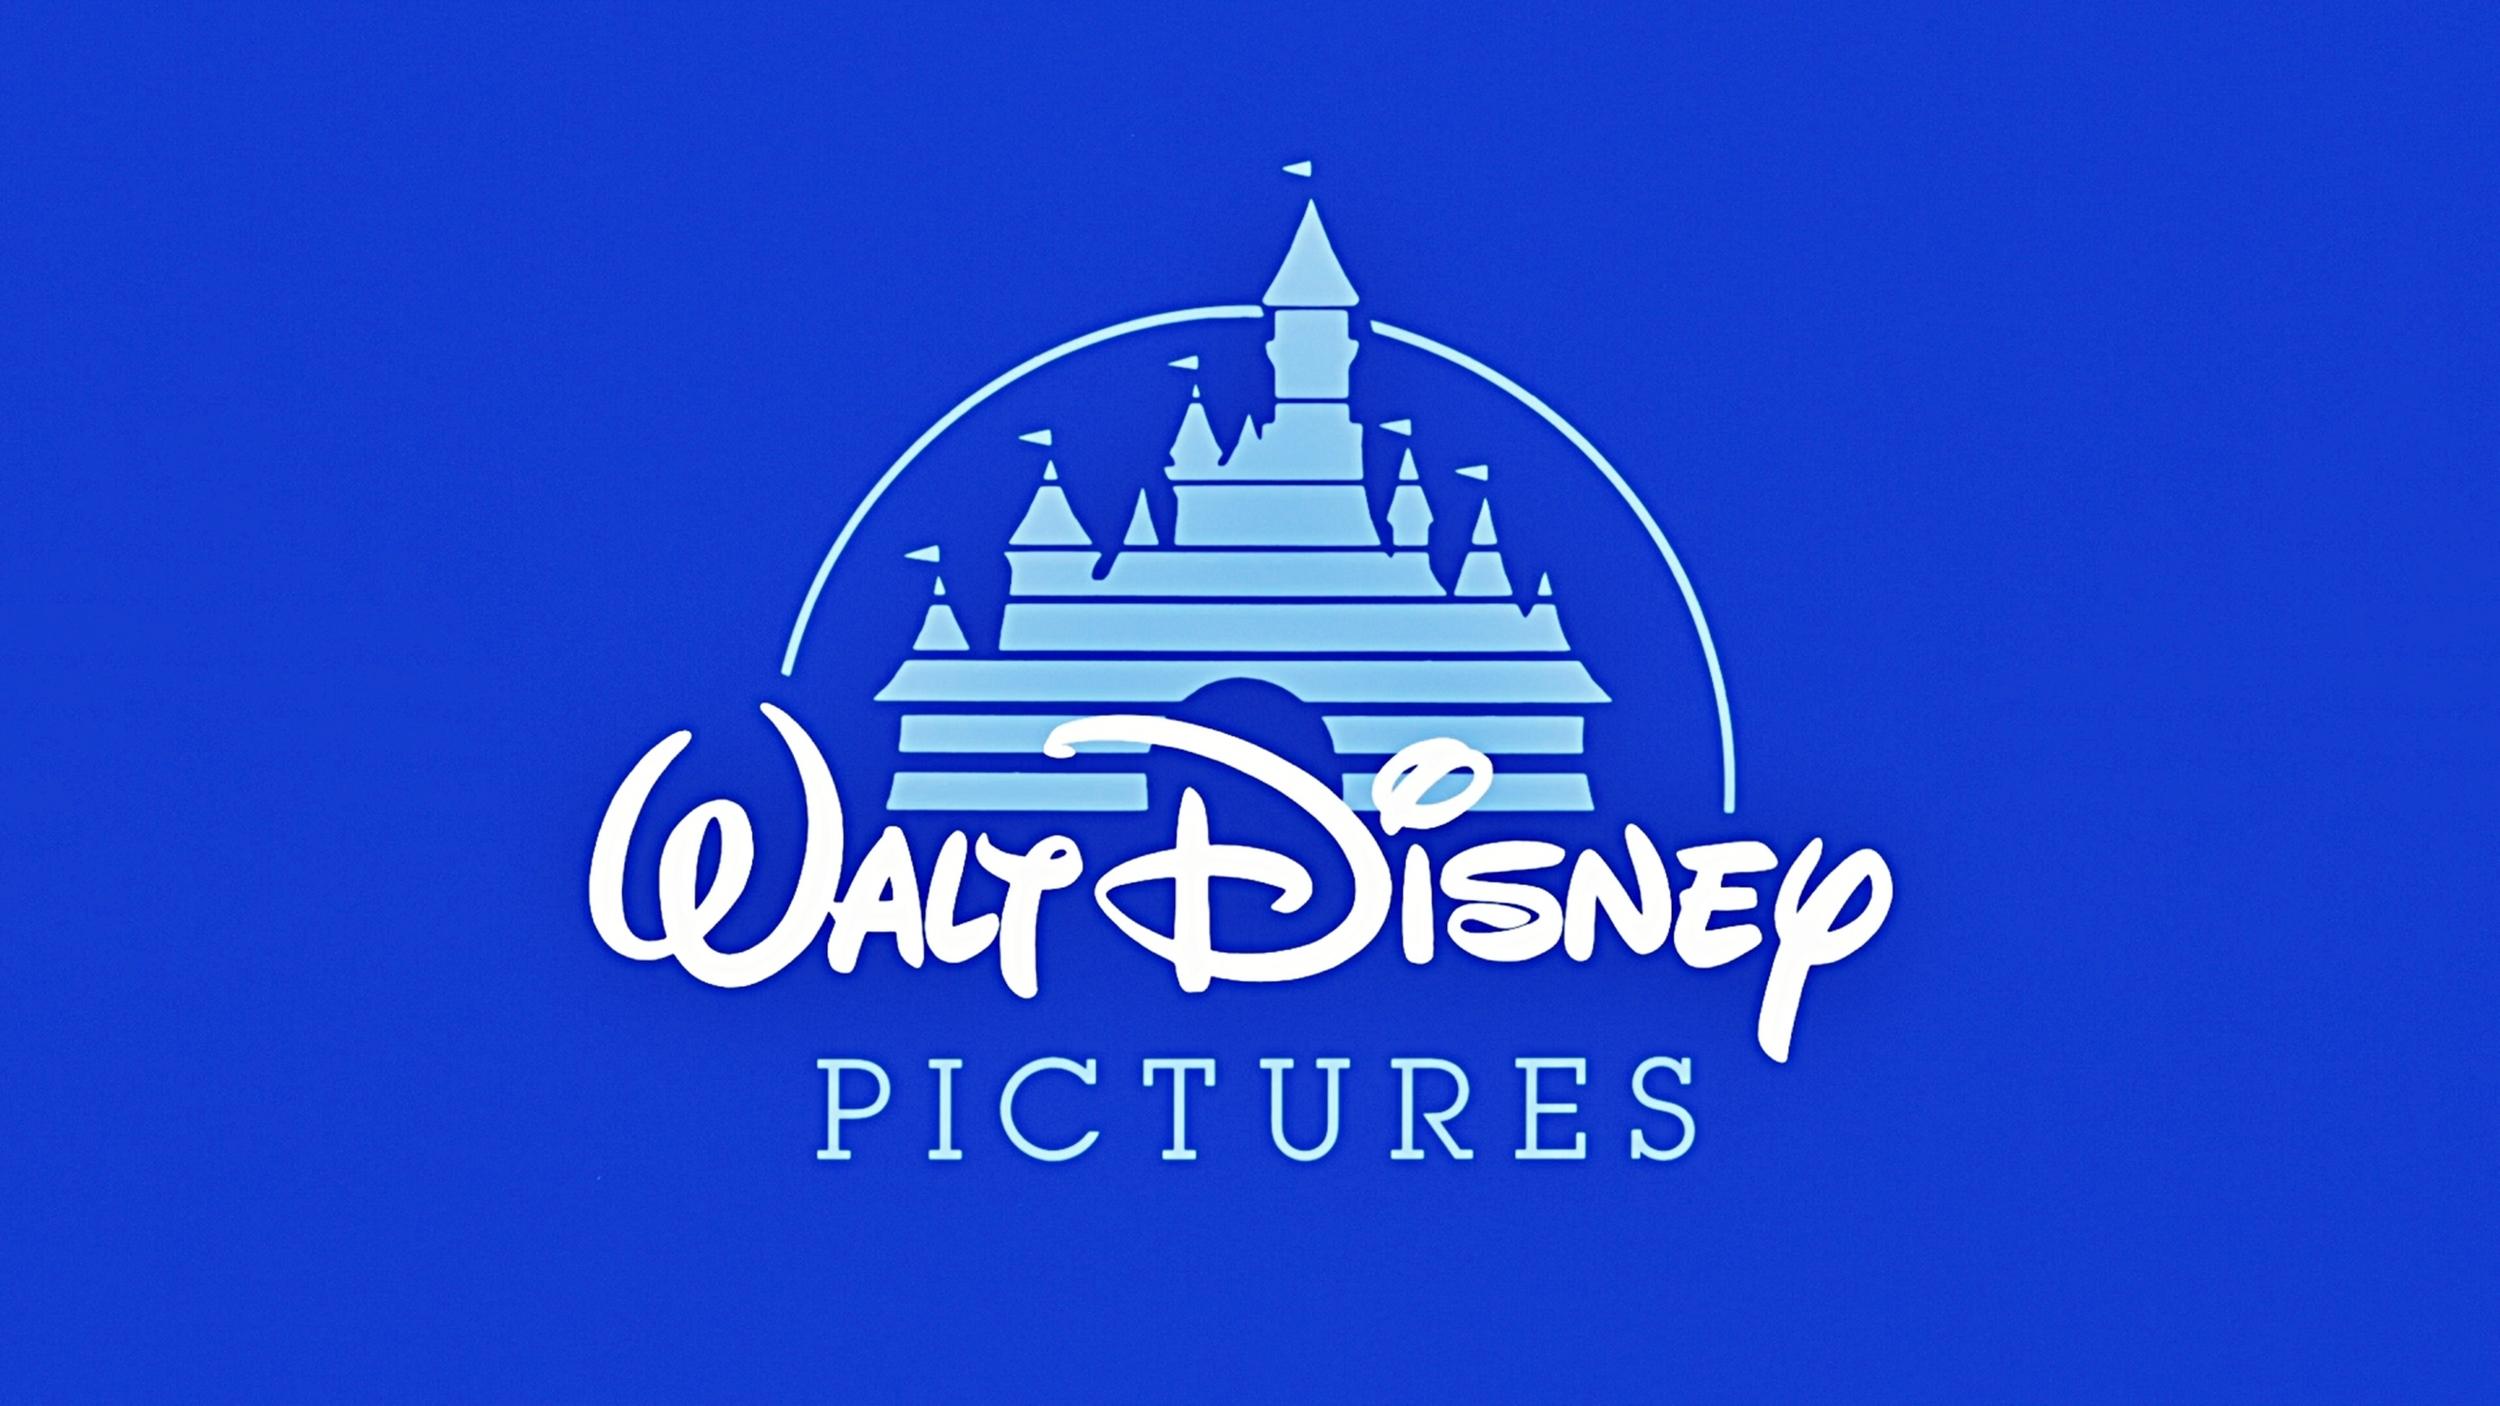 Walt-Disney-Screencaps-The-Walt-Disney-Logo-walt-disney-characters-31872968-2560-1440.jpg